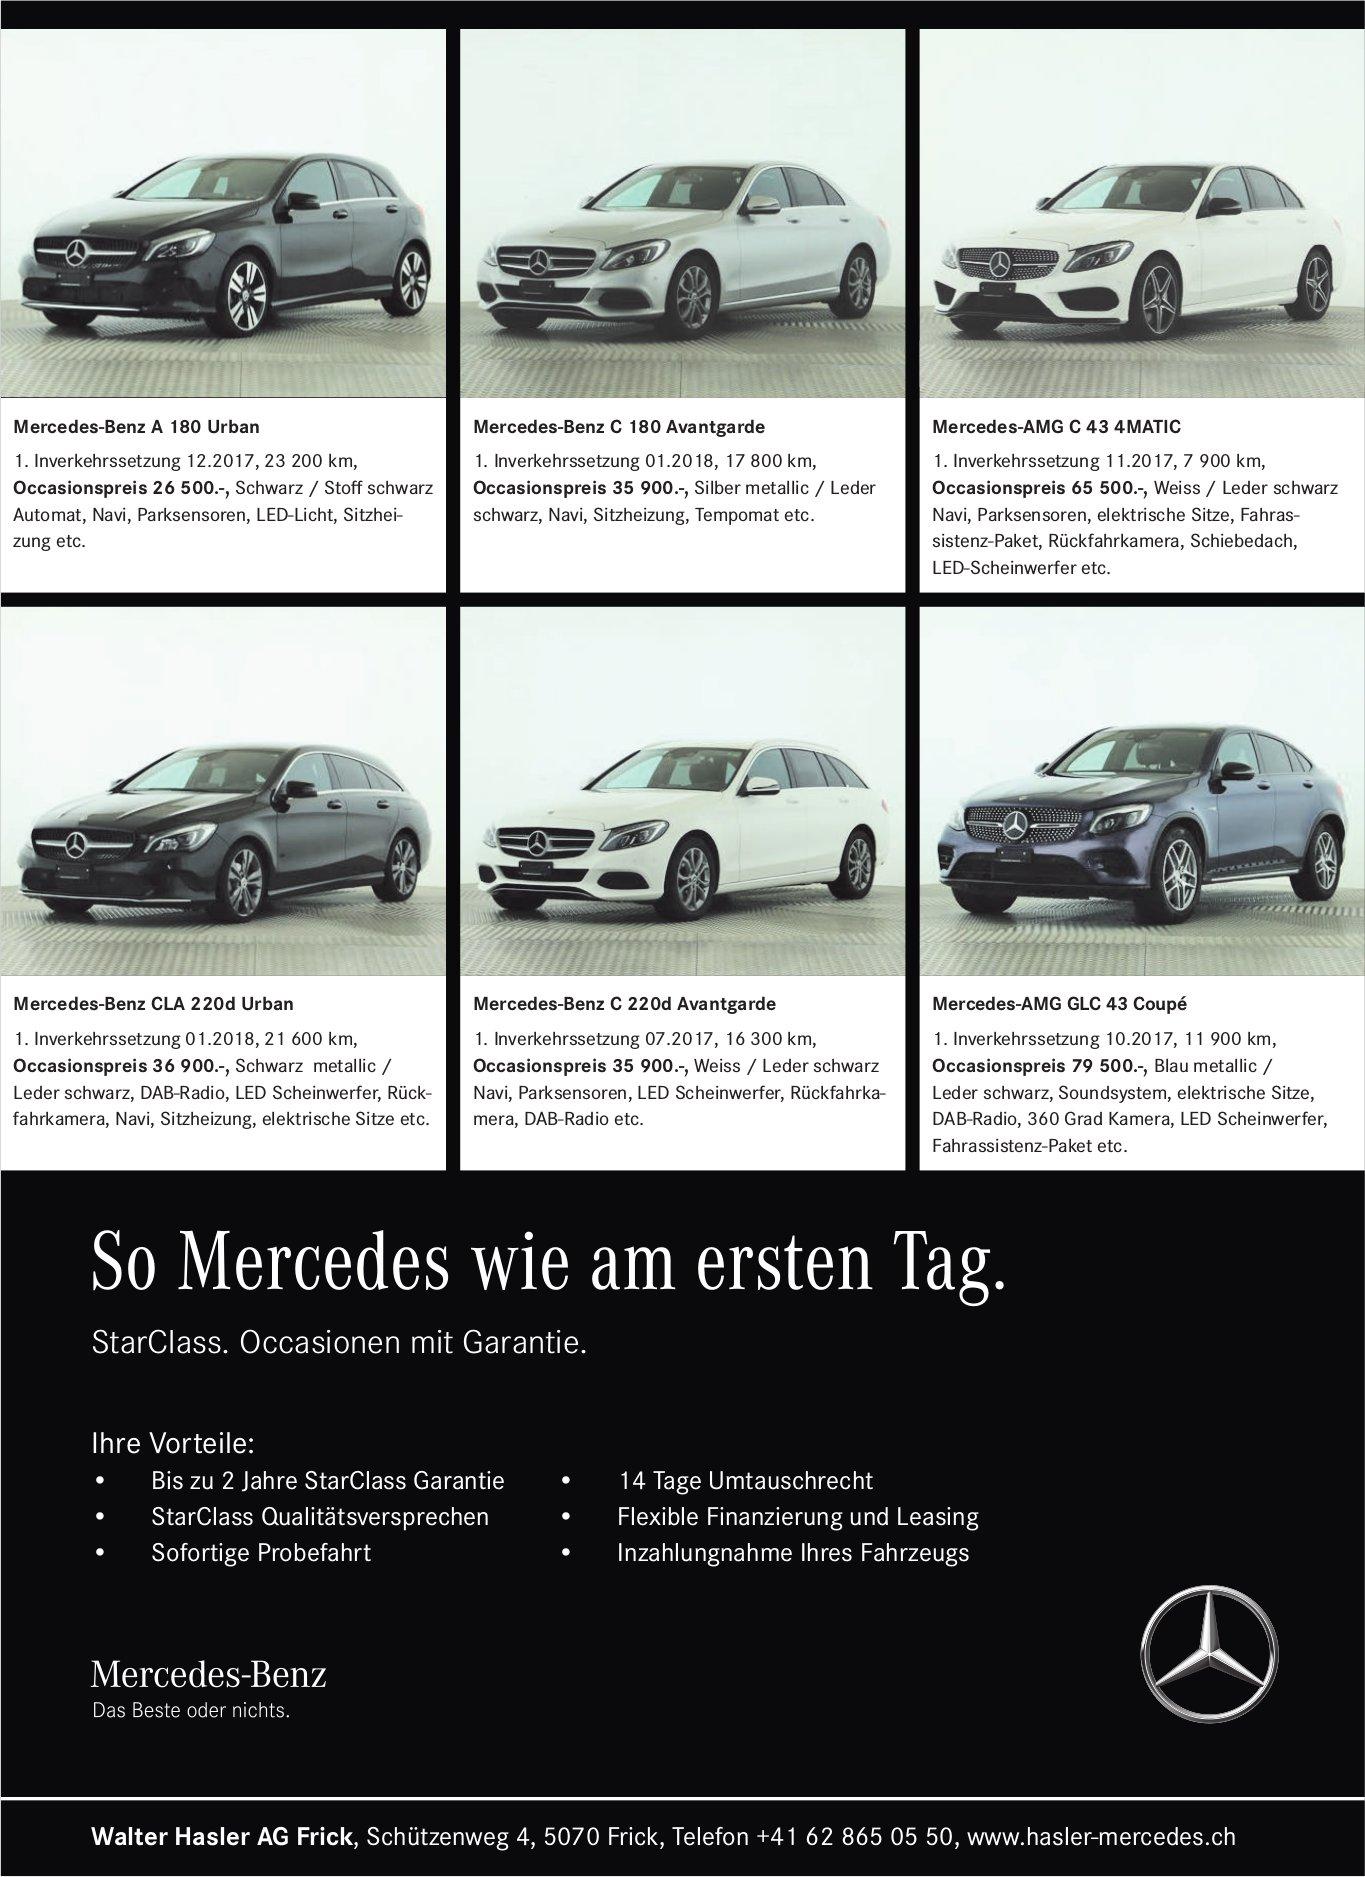 Walter Hasler AG Frick - So Mercedes wie am ersten Tag.